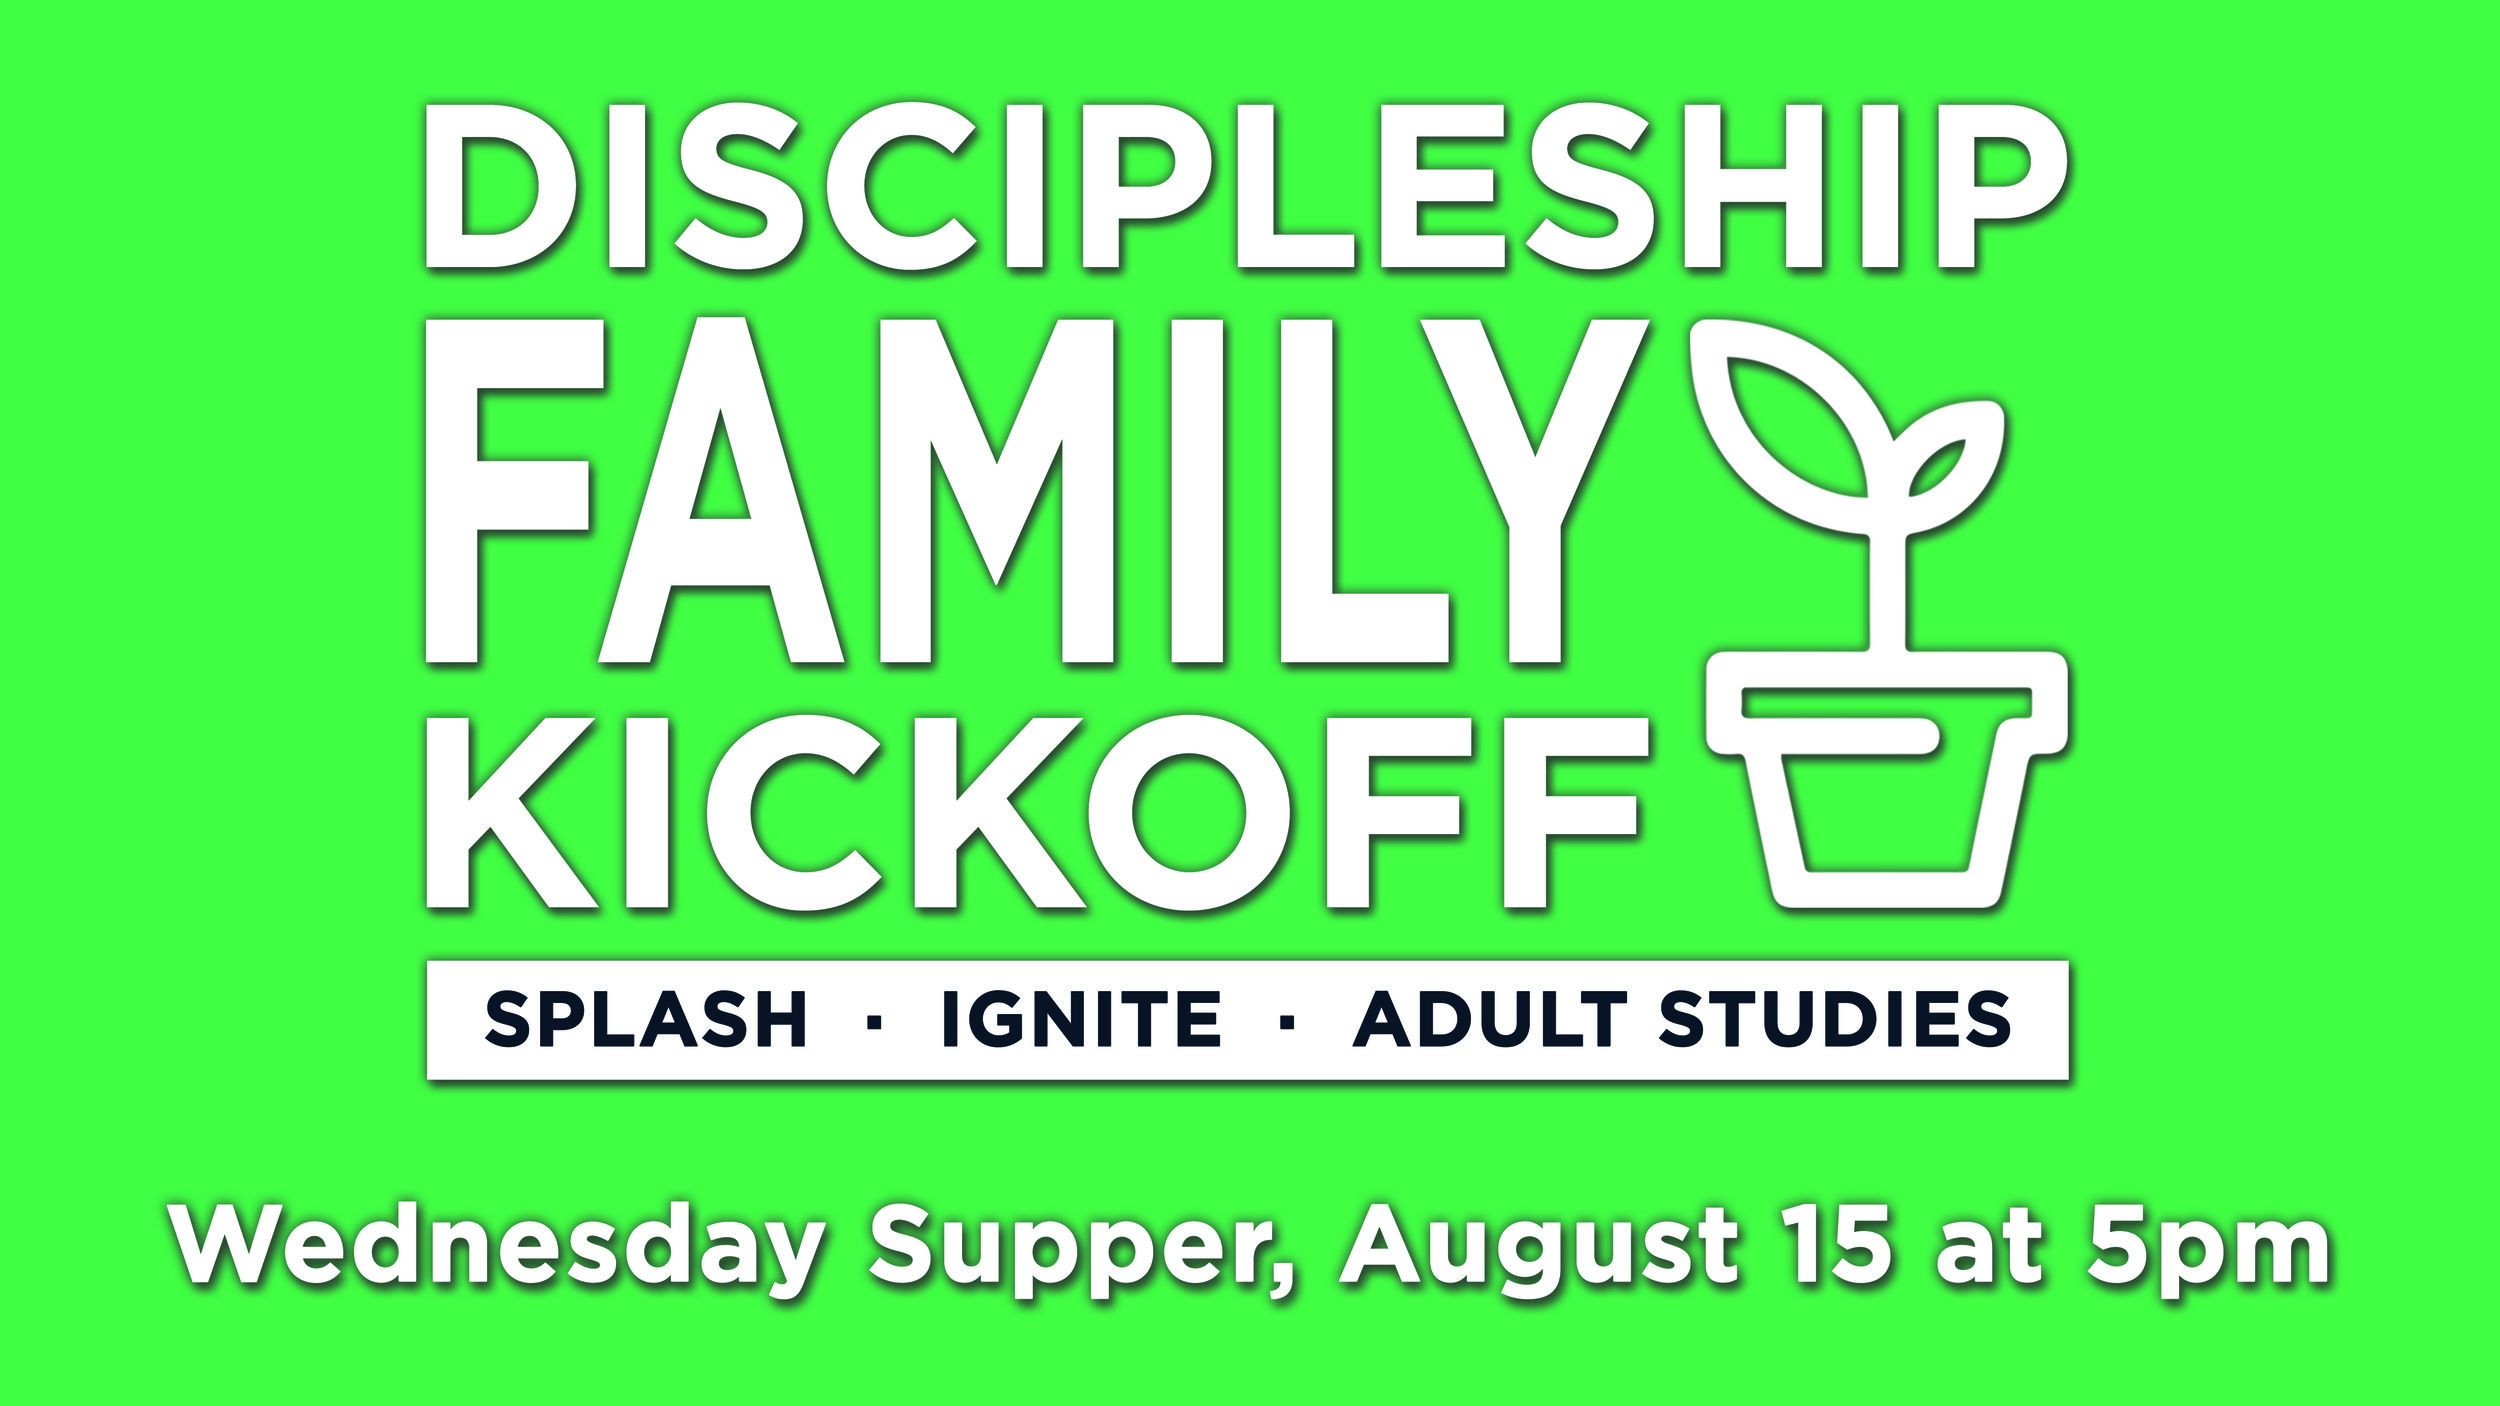 screen_discipleship_family_kickoff_2018_2.jpg